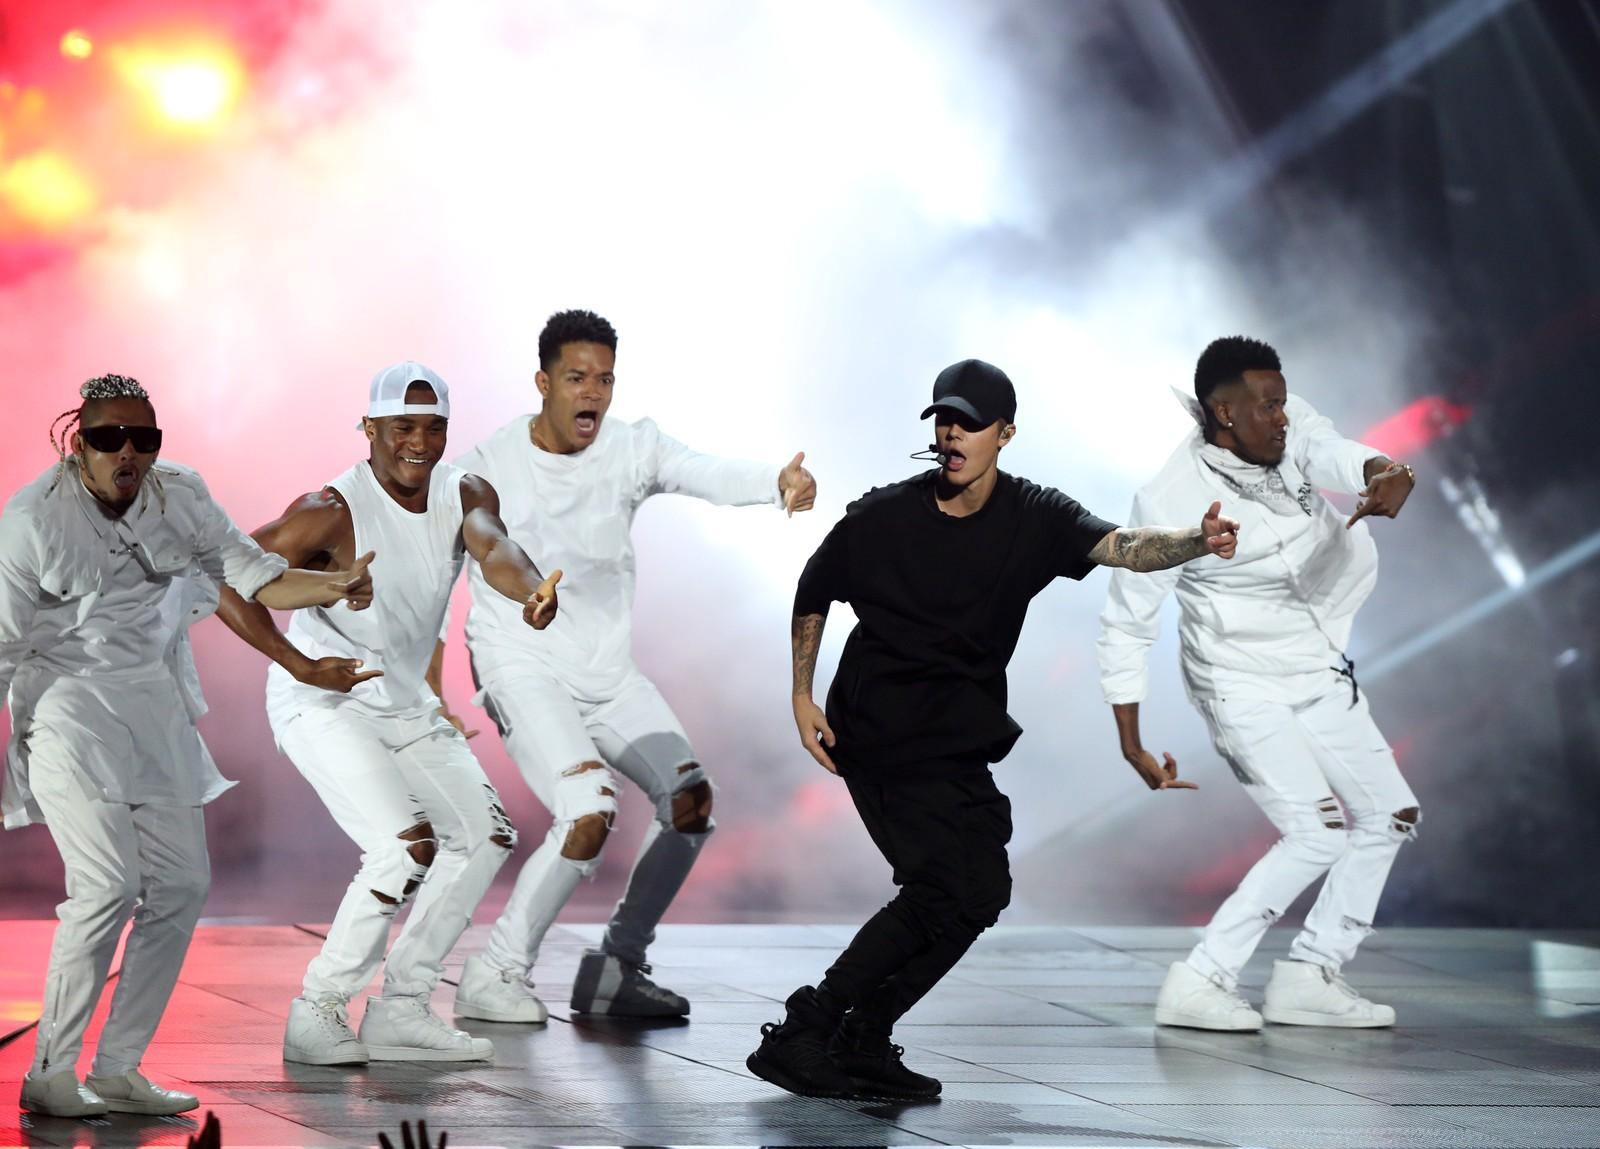 Justin Bieber underholdt med et forrykende sceneshow. Han skal ha blitt rørt til tårer over sin egen sang.